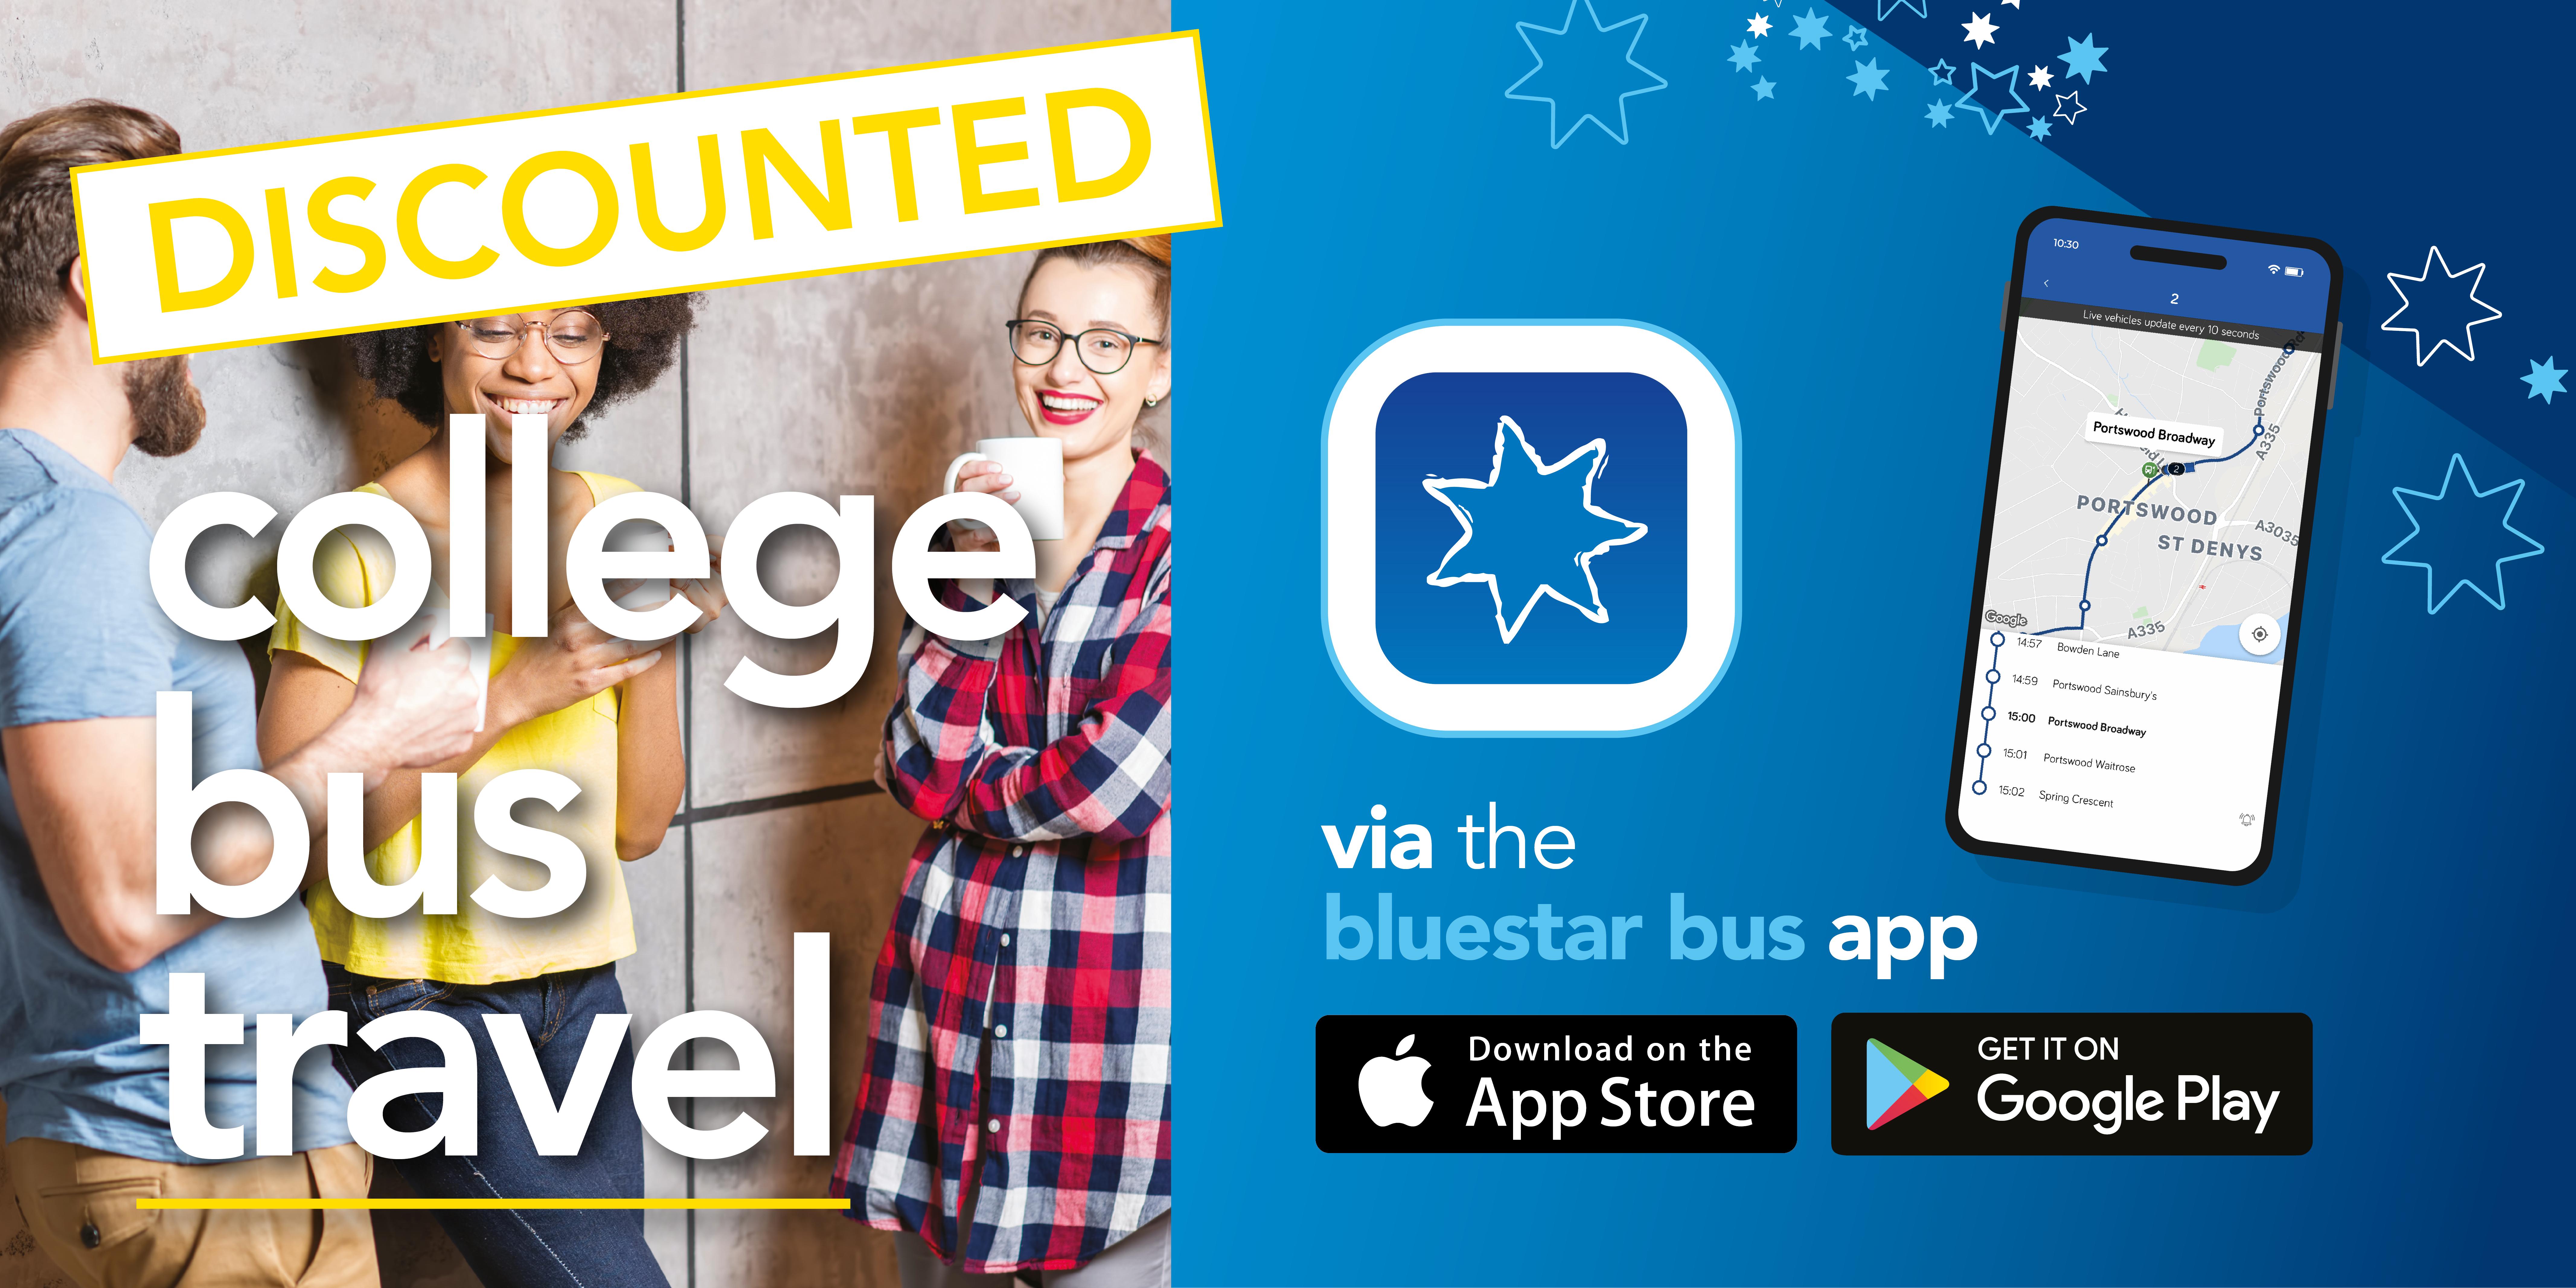 discounted college bus travel via the bluestar bus app